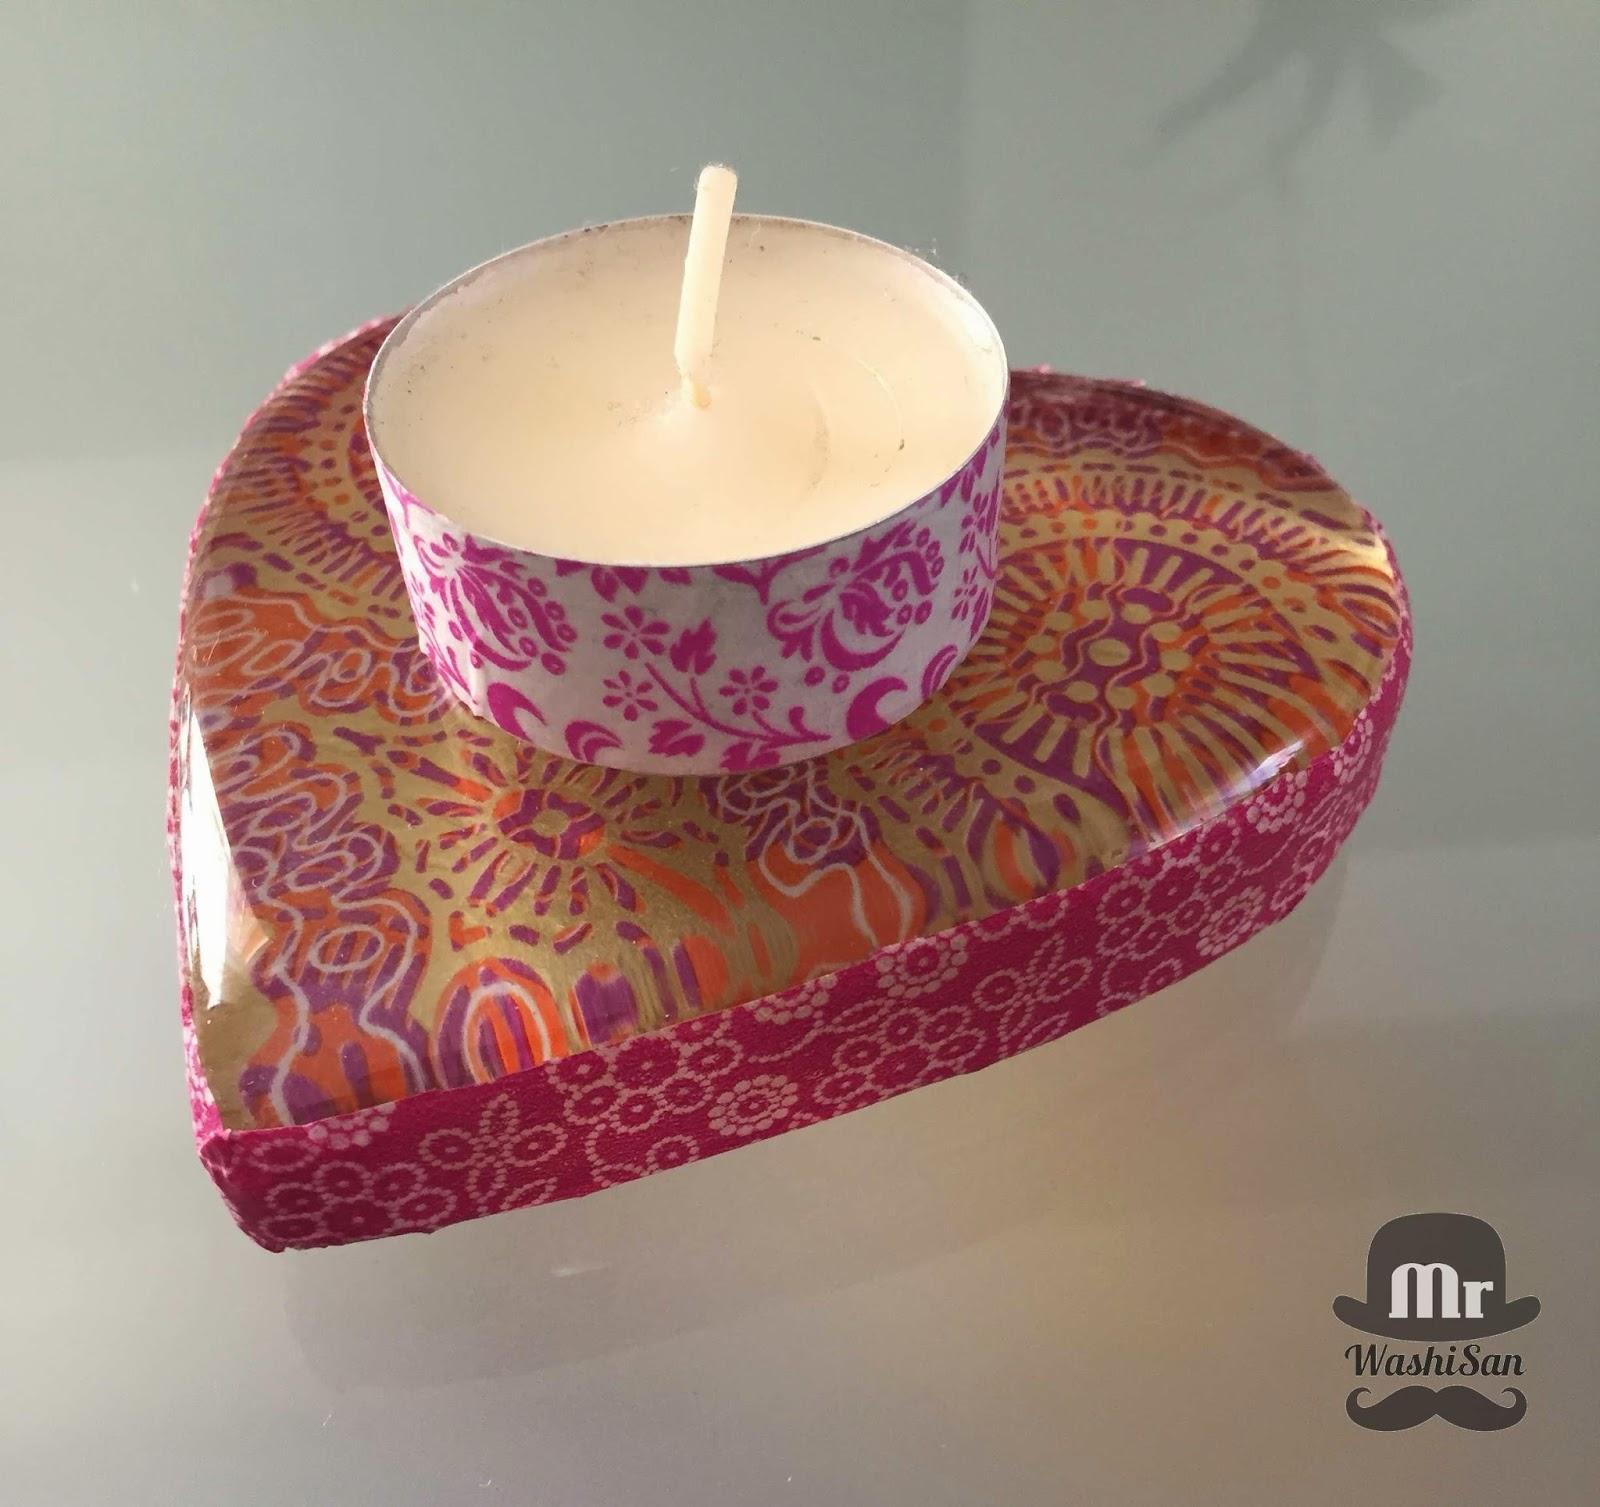 Corazón de cristal con decoupage y washitape diy handmade by mrwashisan http://mrwashisan.blogspot.com.es